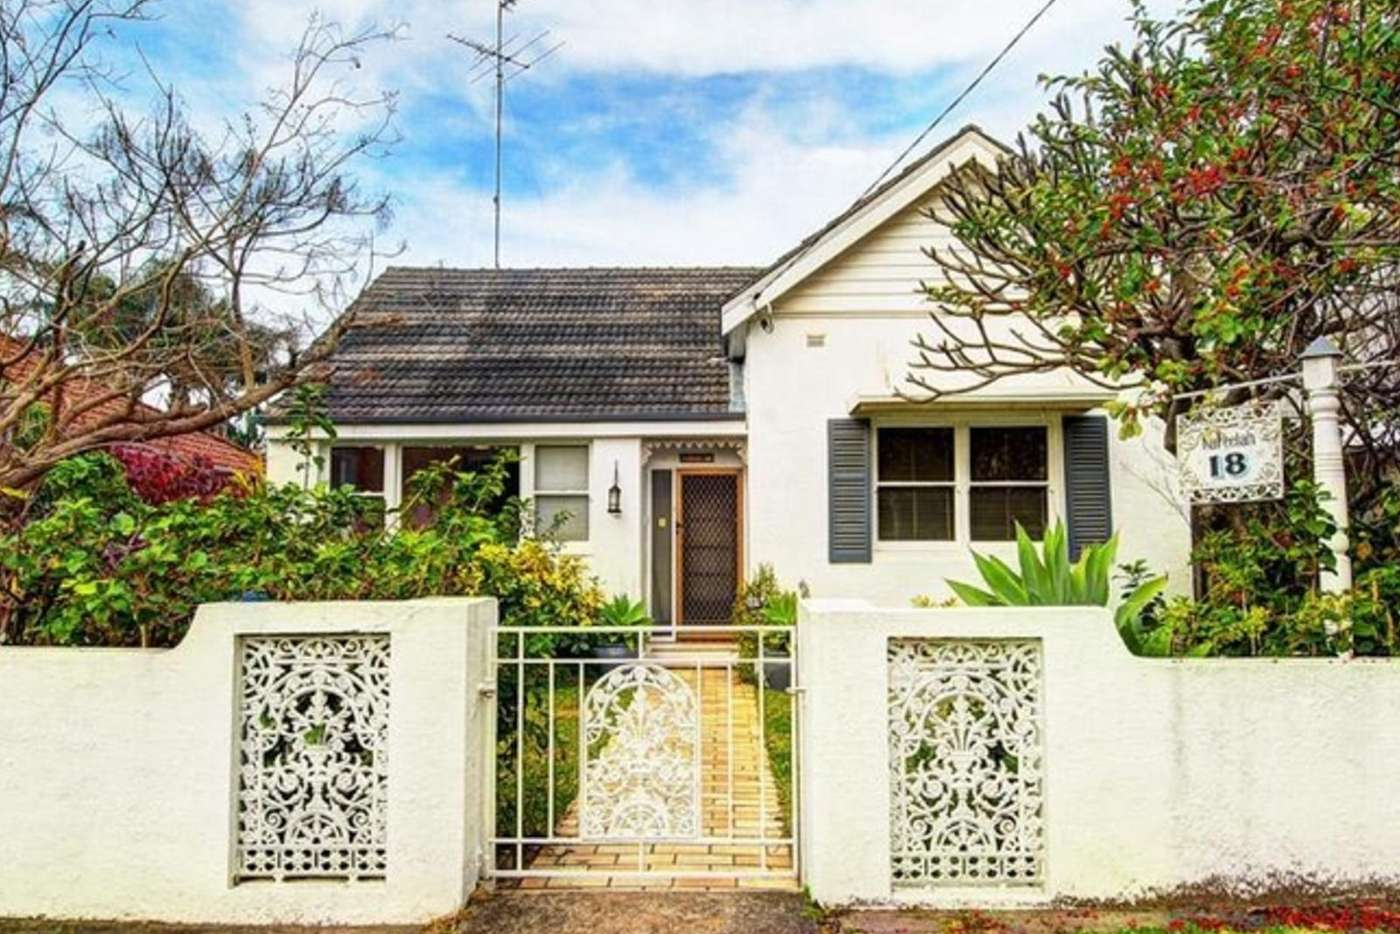 Main view of Homely house listing, 18 Tasman Street, Bondi NSW 2026